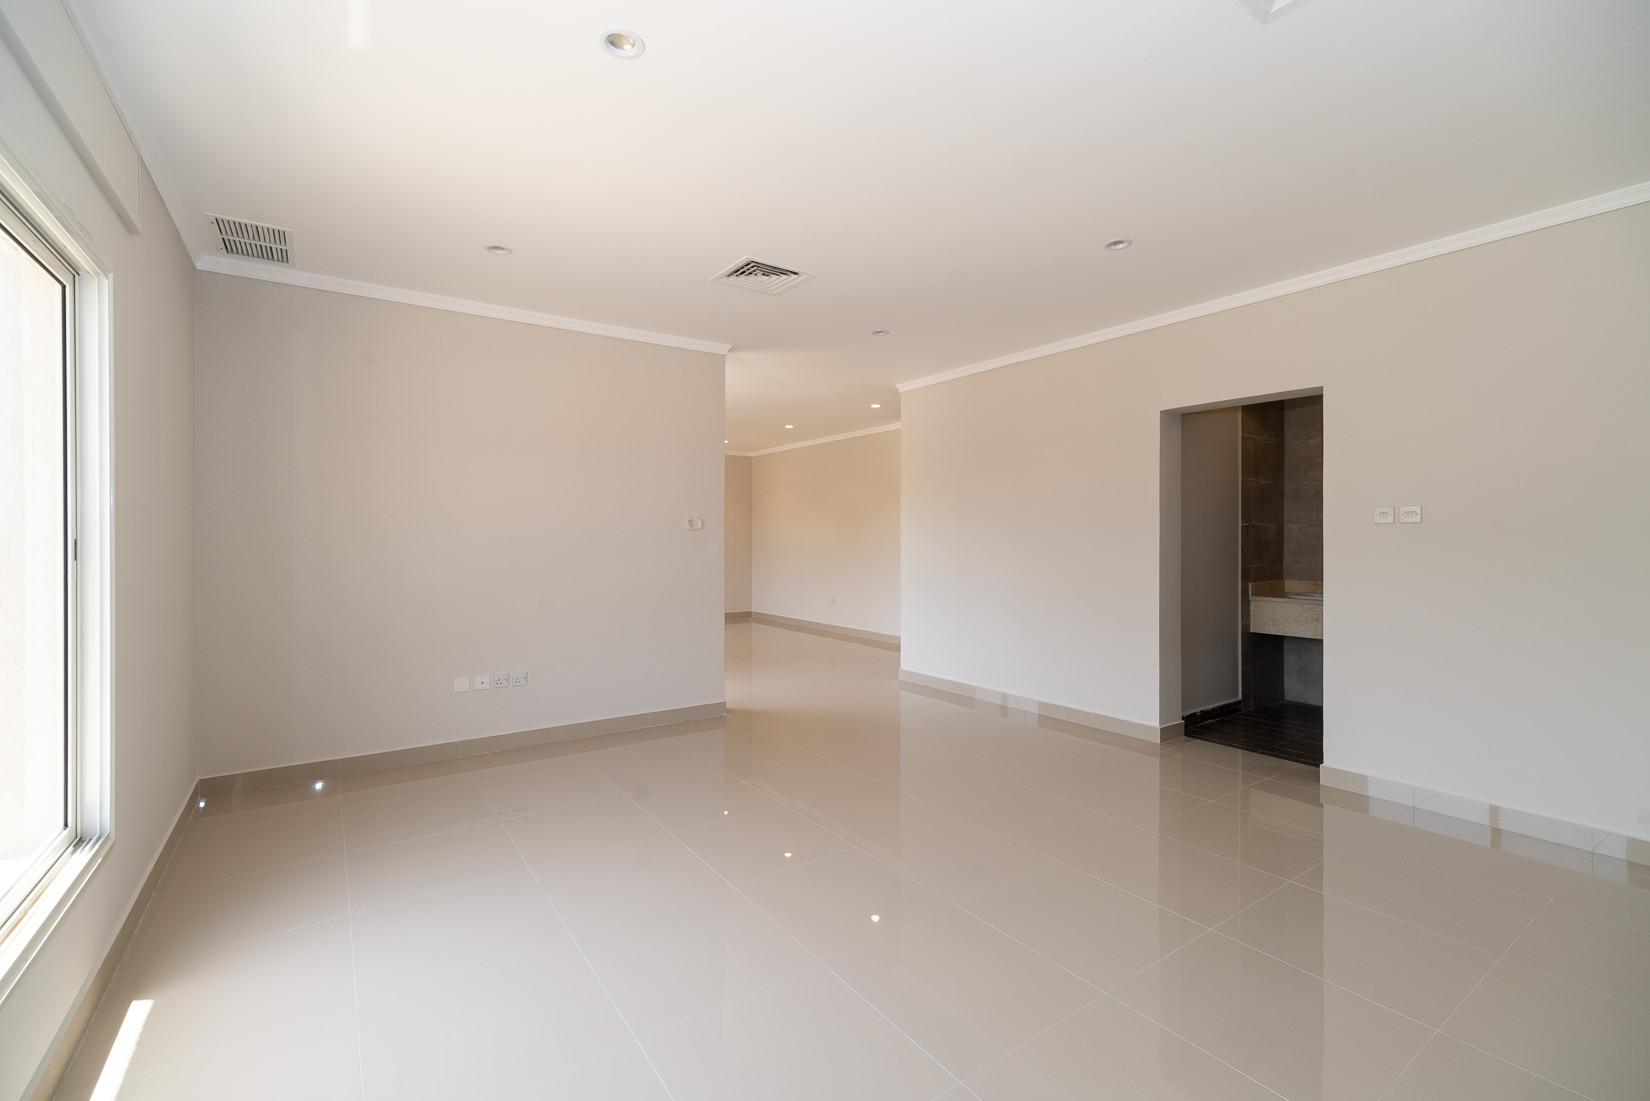 Abu Halifa – new, unfurnished three bedroom floors